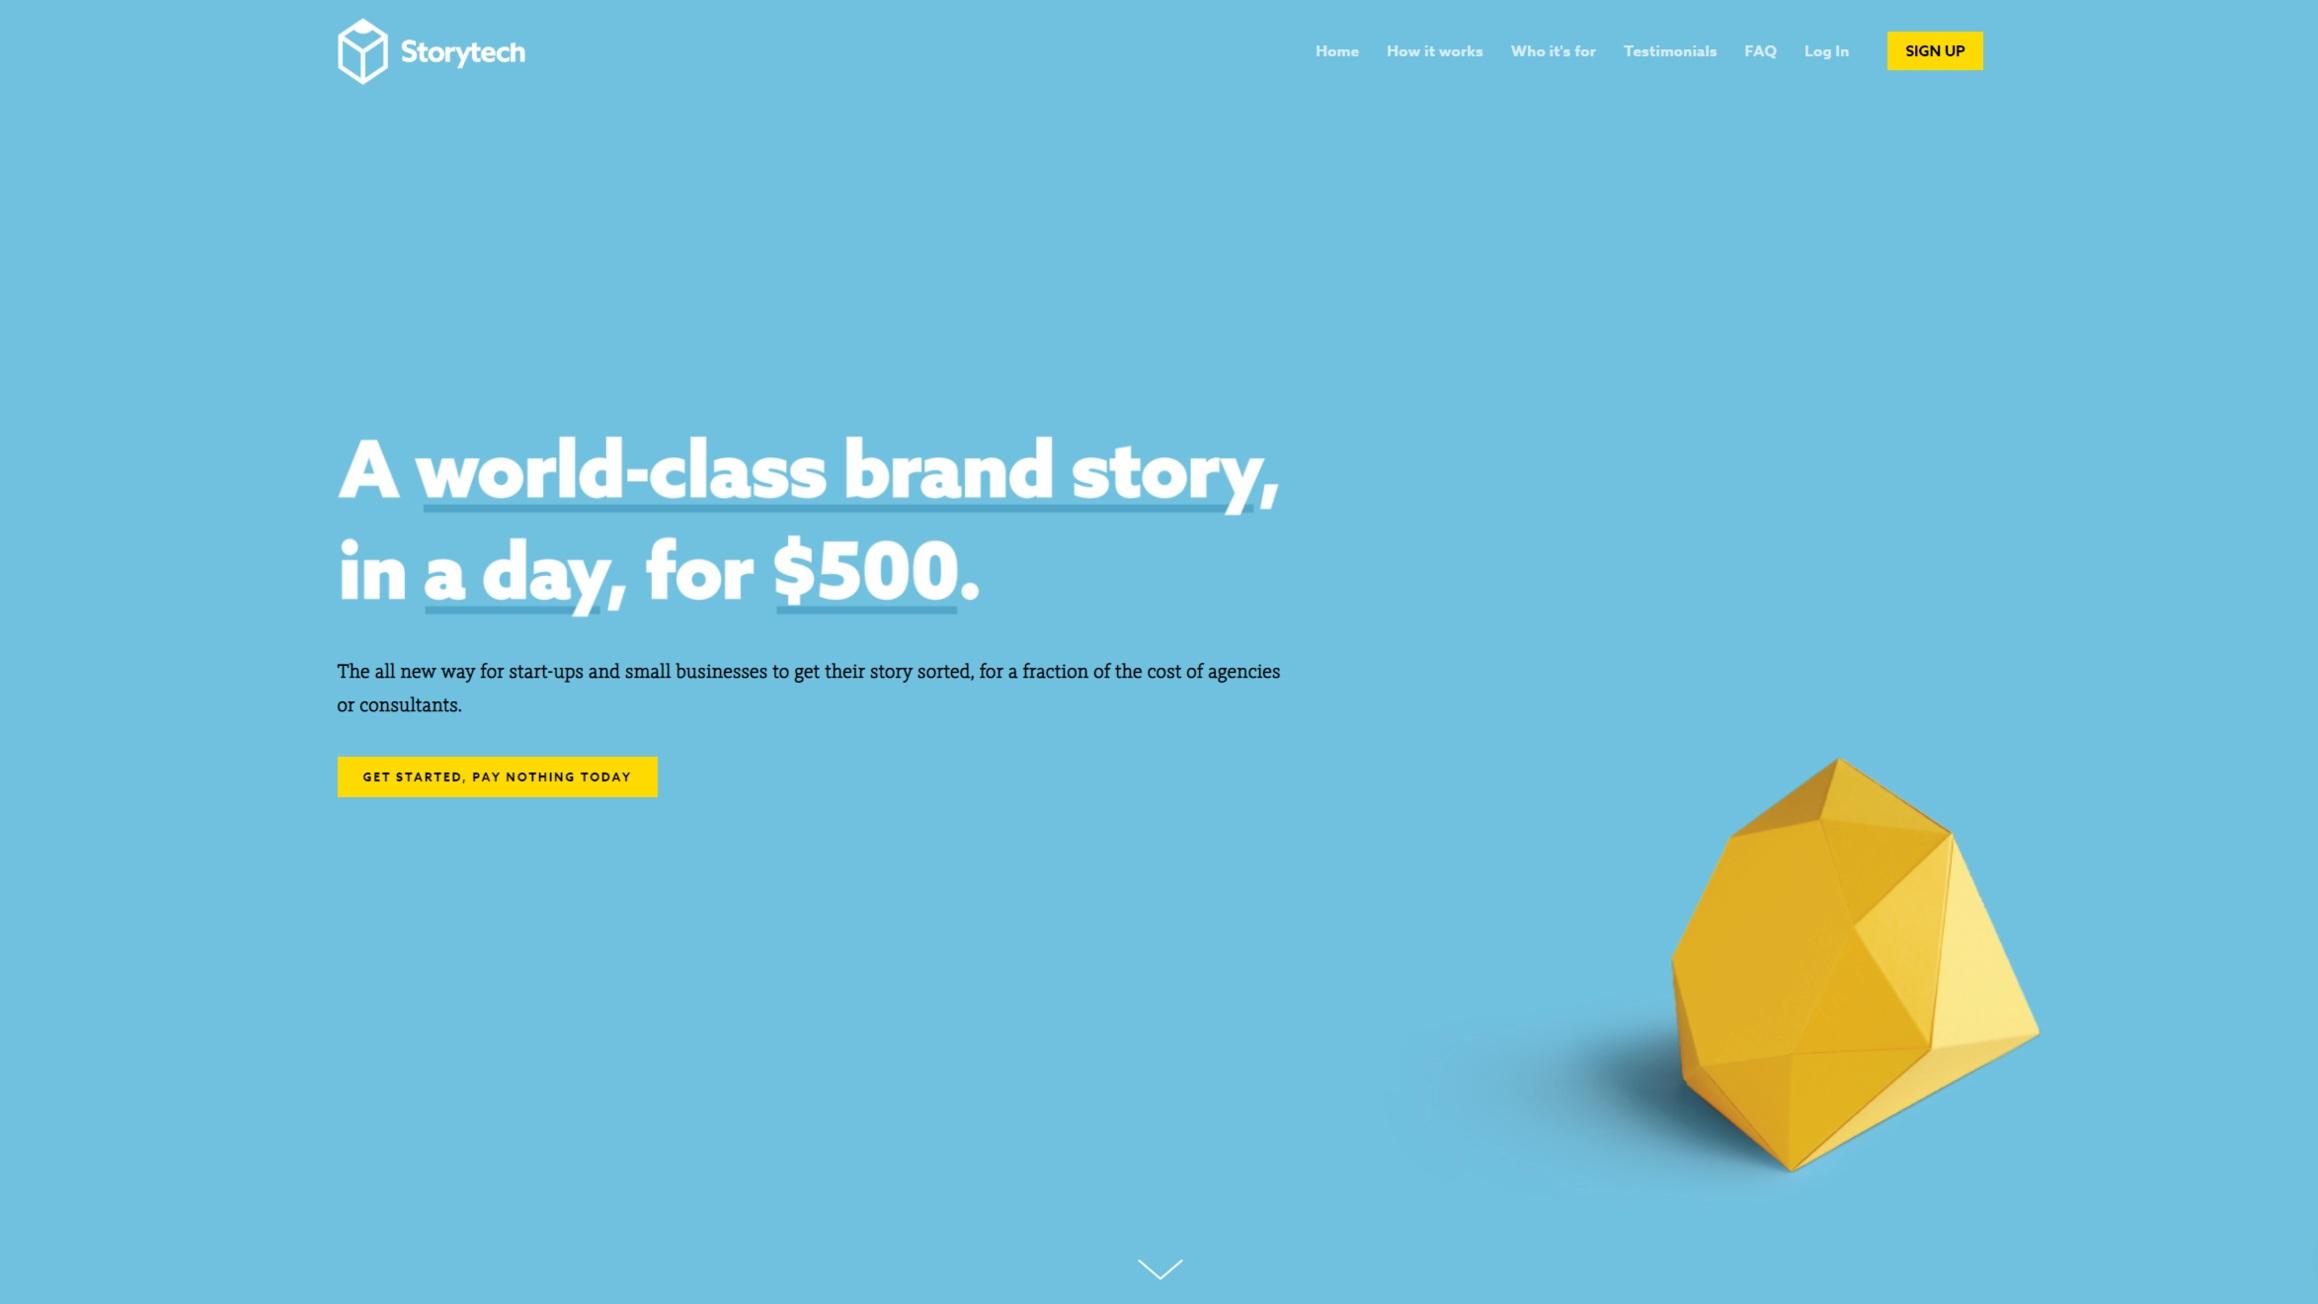 Storytech